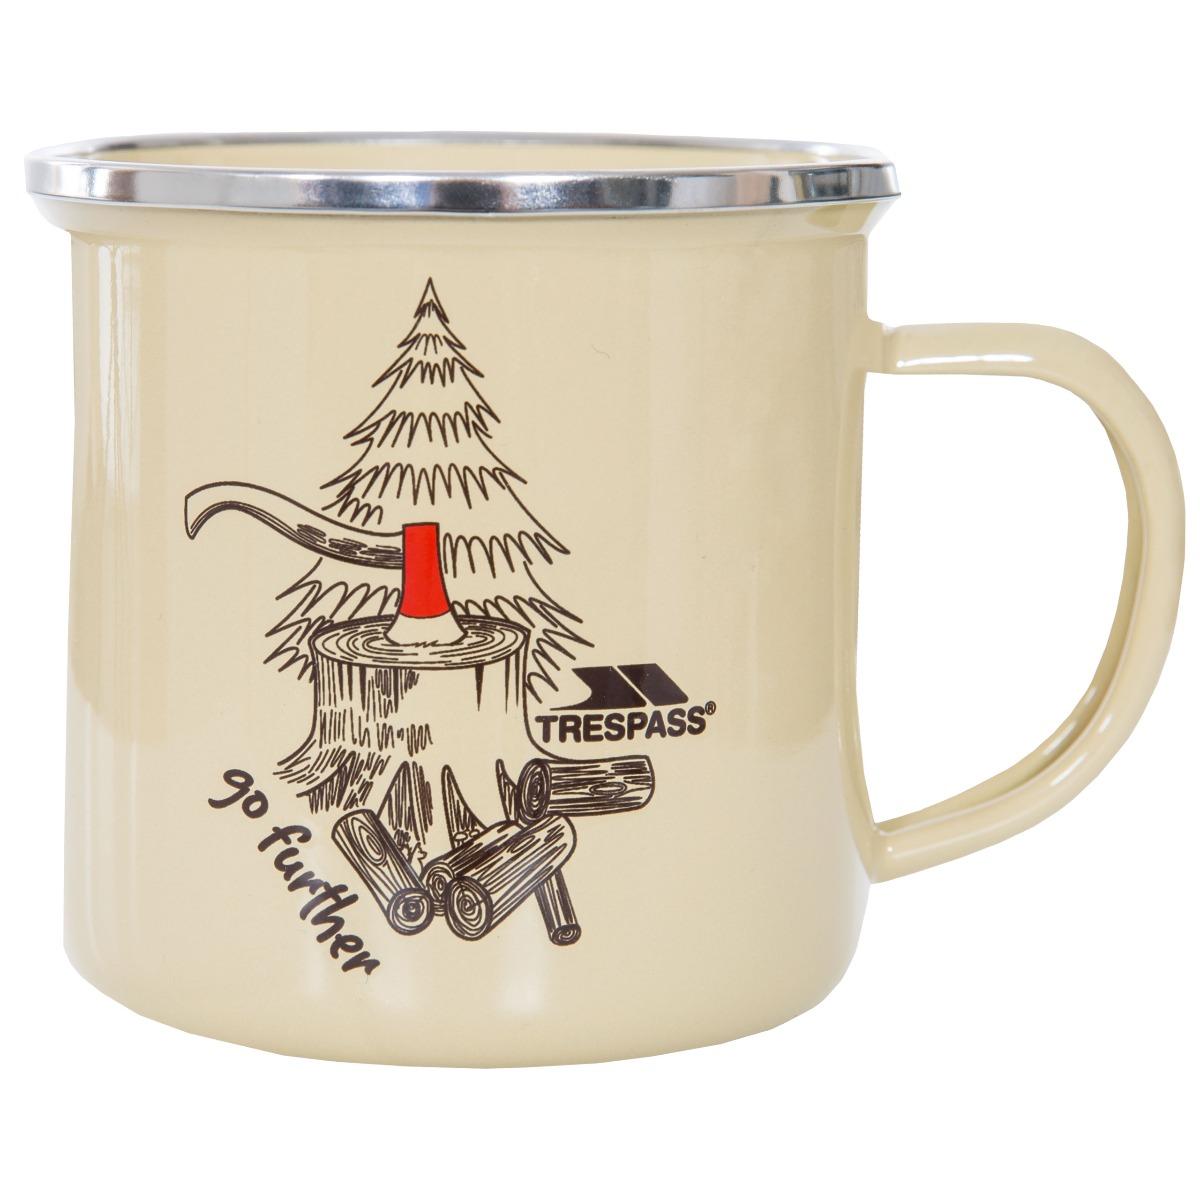 Trespass Elma Enamel Camping Mug